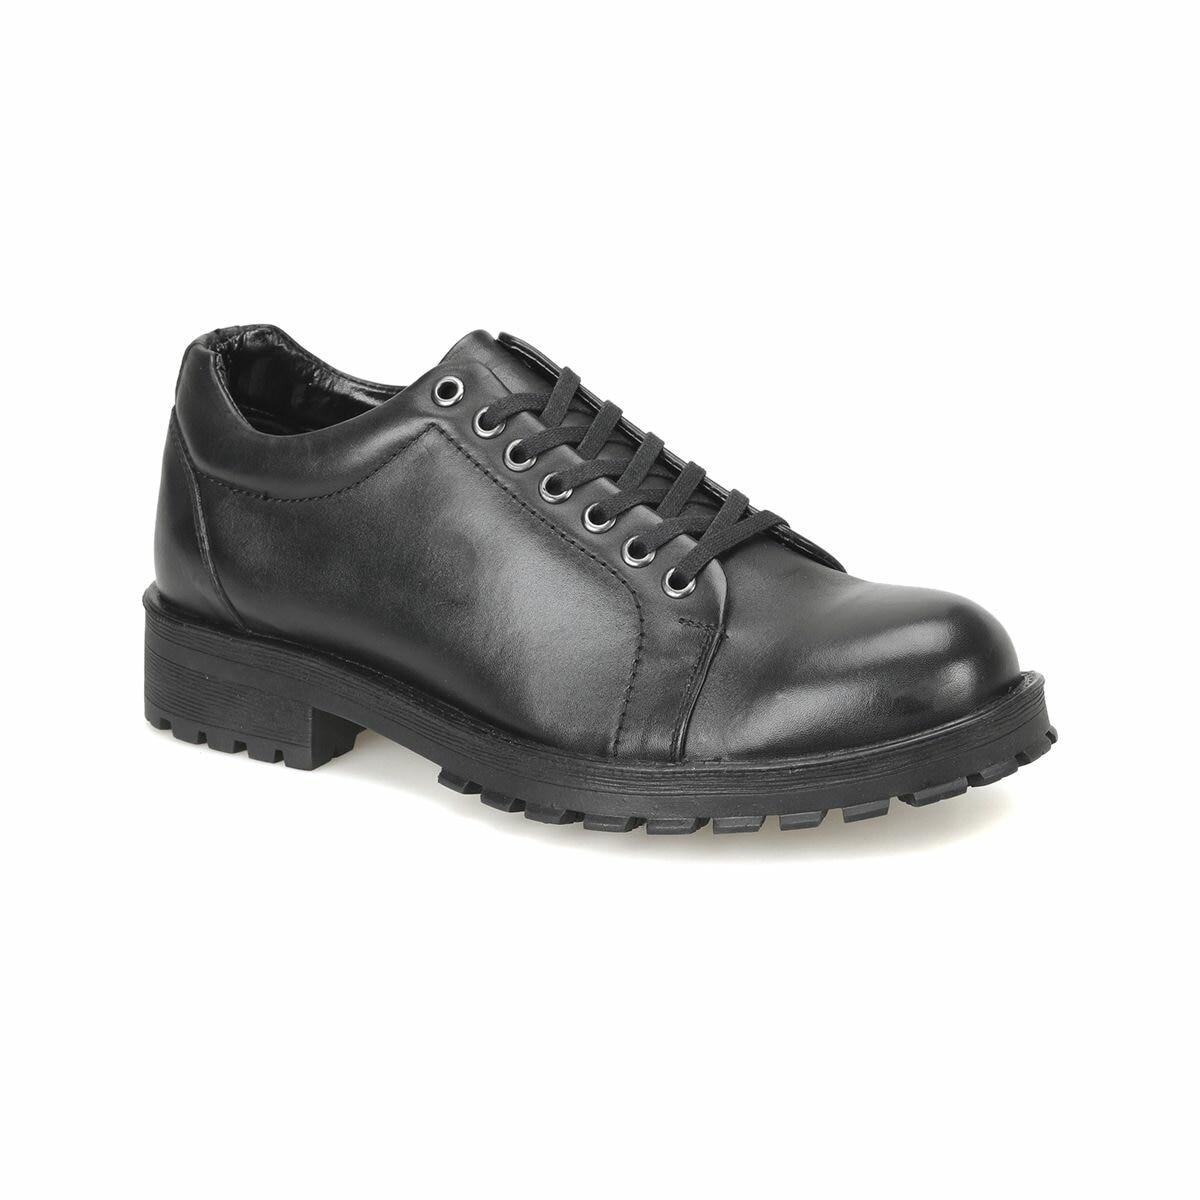 FLO MKM-50944-3 Black Male Shoes Oxide